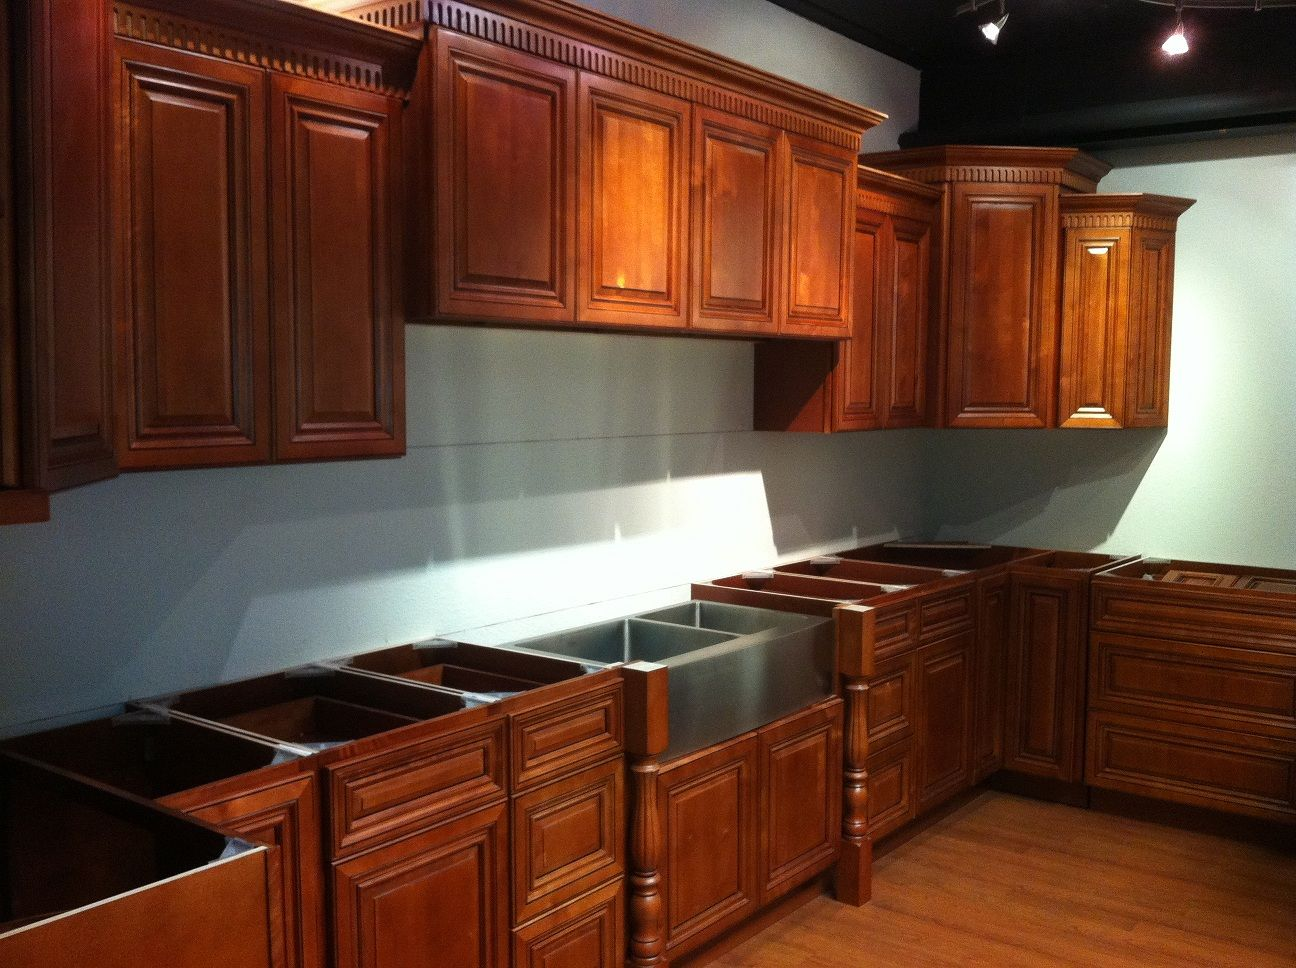 Mahogany Glazed Kitchen Cabinets Buy Kitchen Cabinets Online Wholesale Kitchen Cabinets Maple Kitchen Cabinets